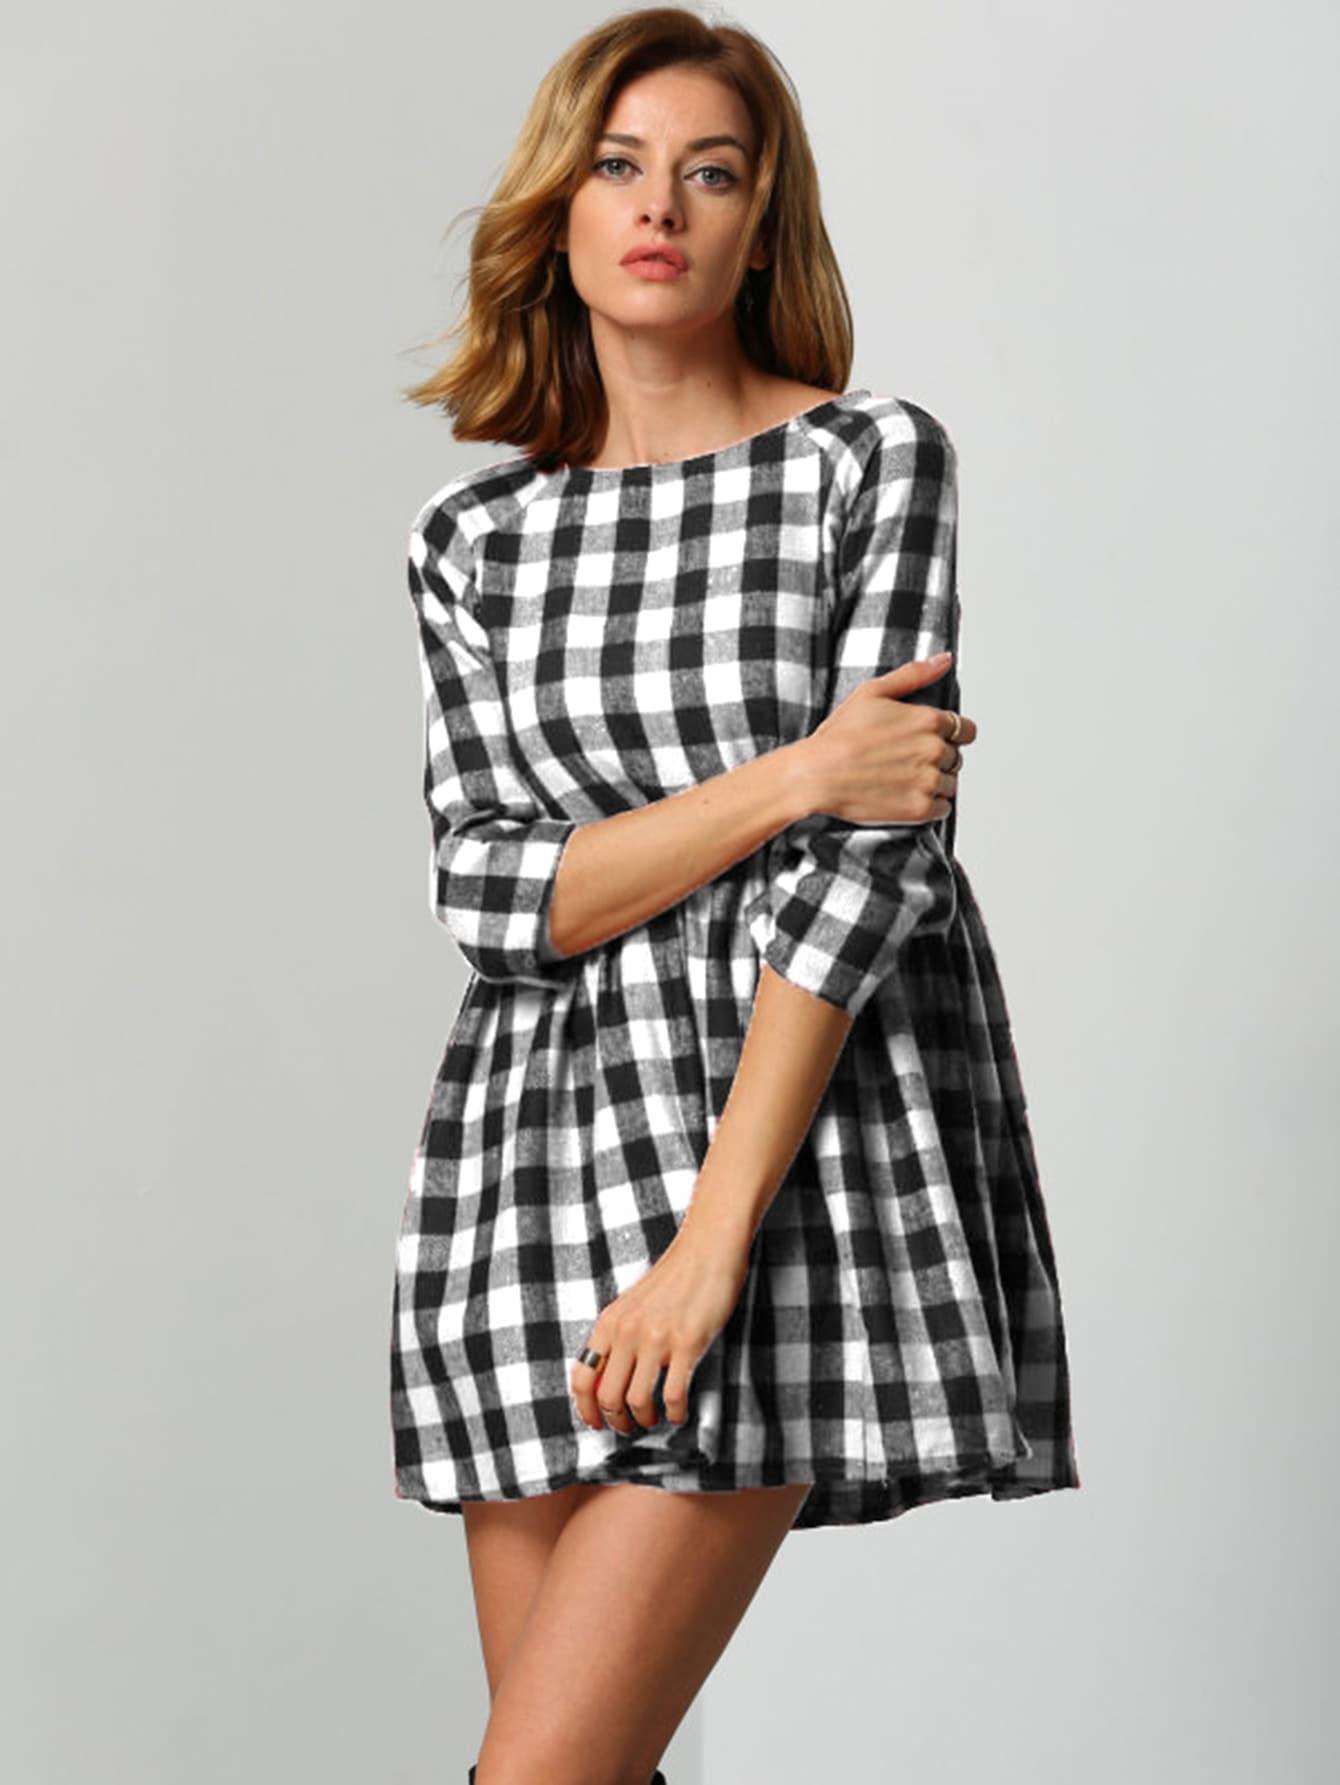 Raglan Sleeve Smock Gingham Dress raglan sleeve smock gingham dress